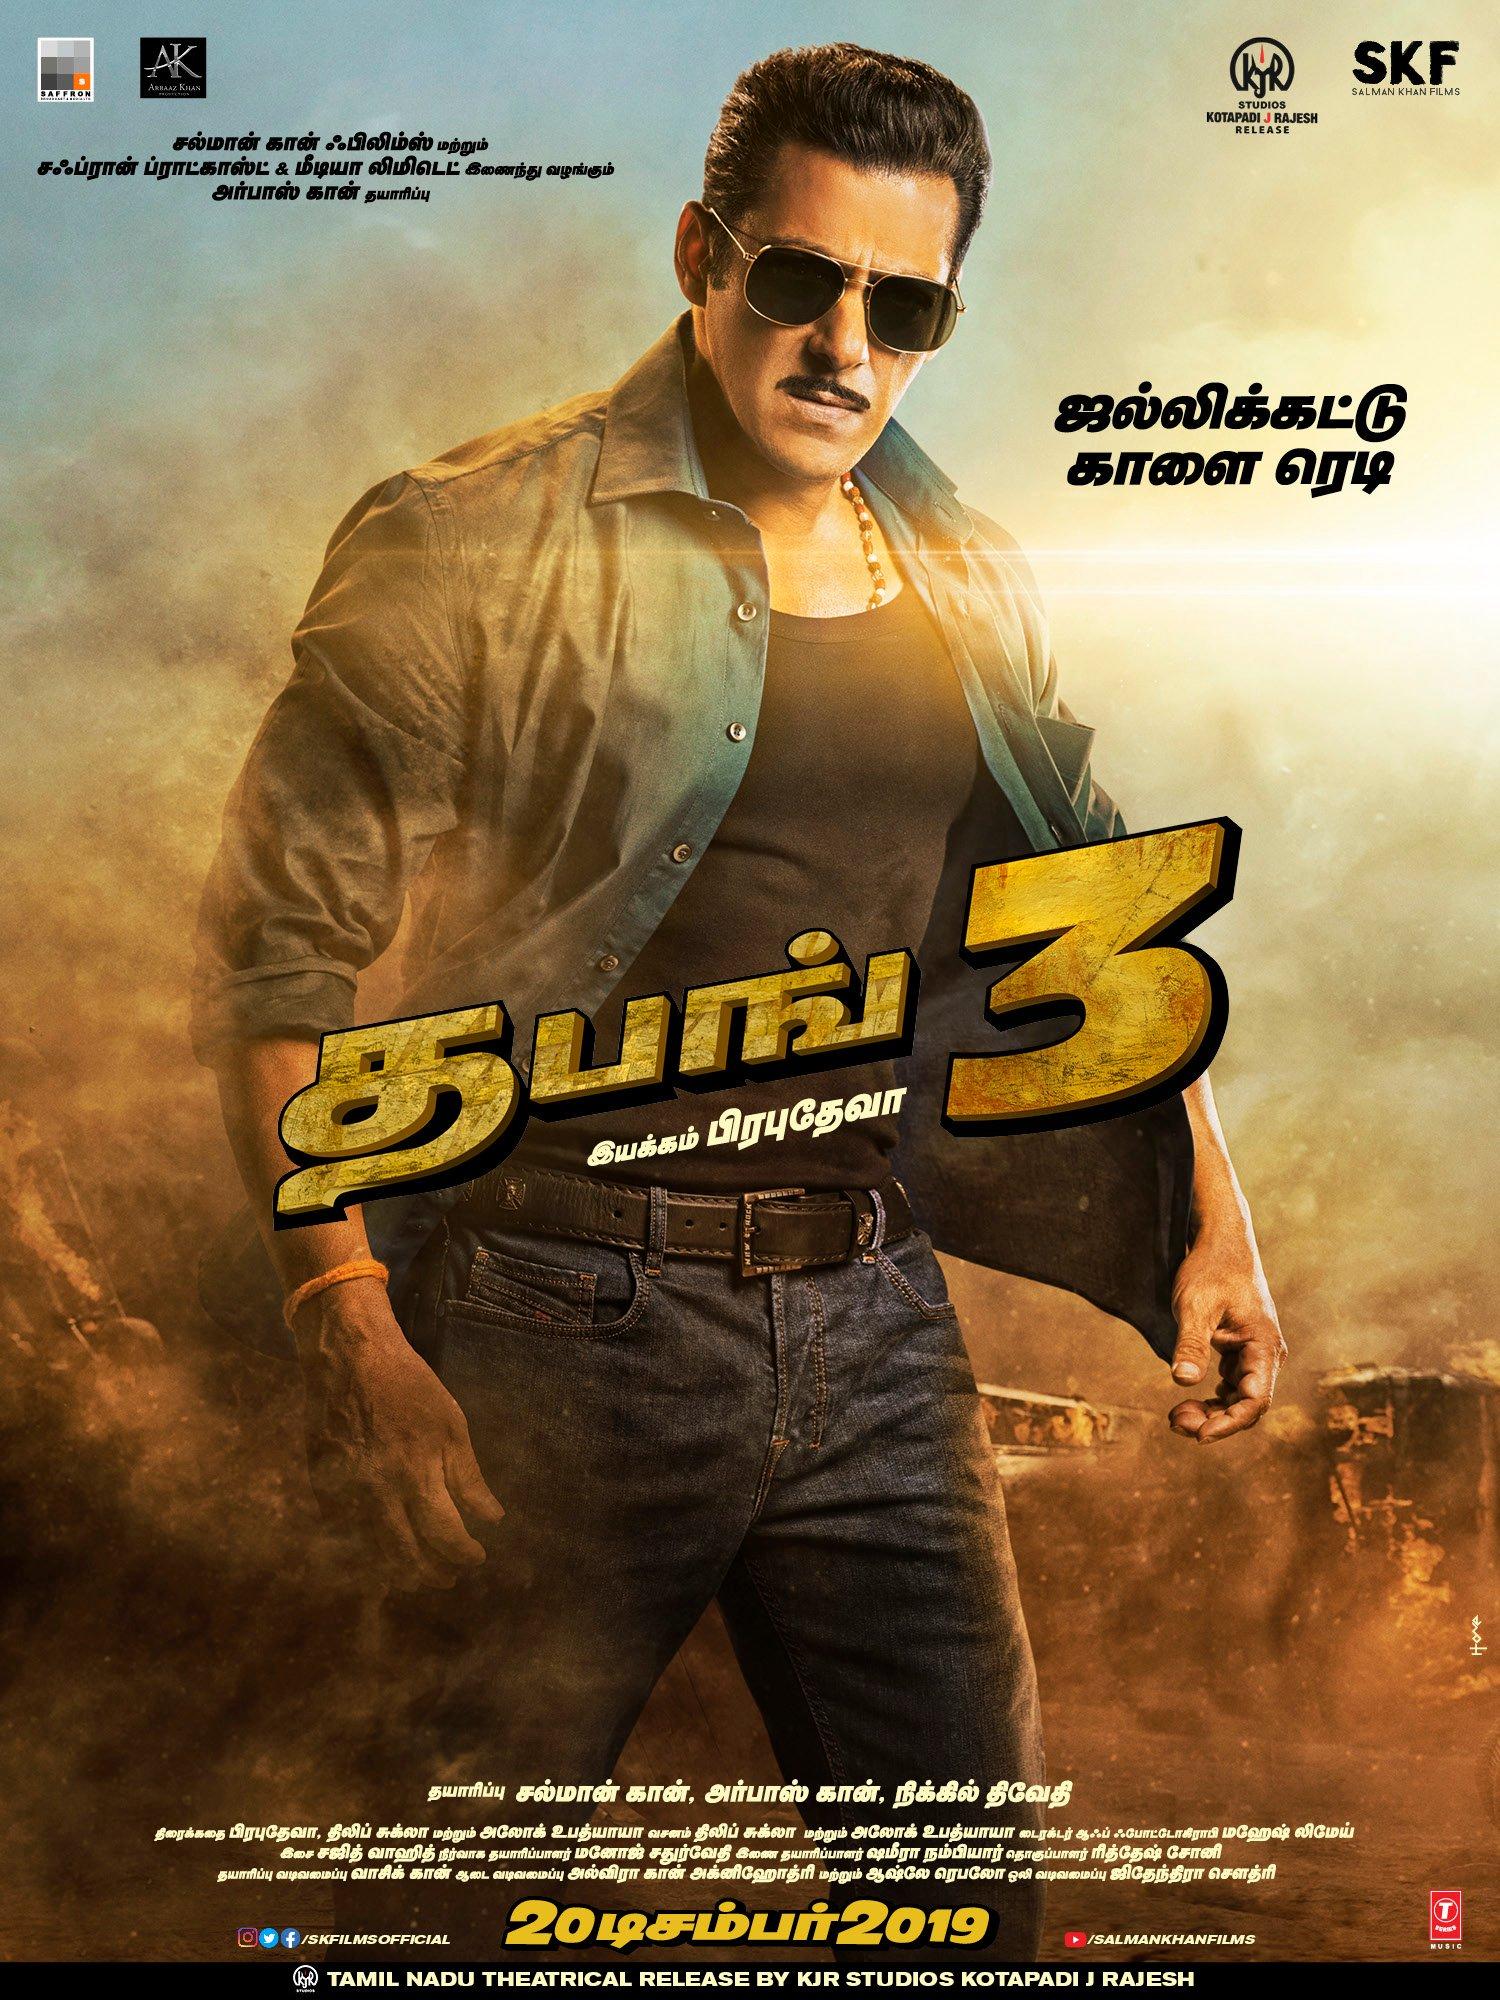 Salman Khan Dabangg 3 First Look Poster HD Released